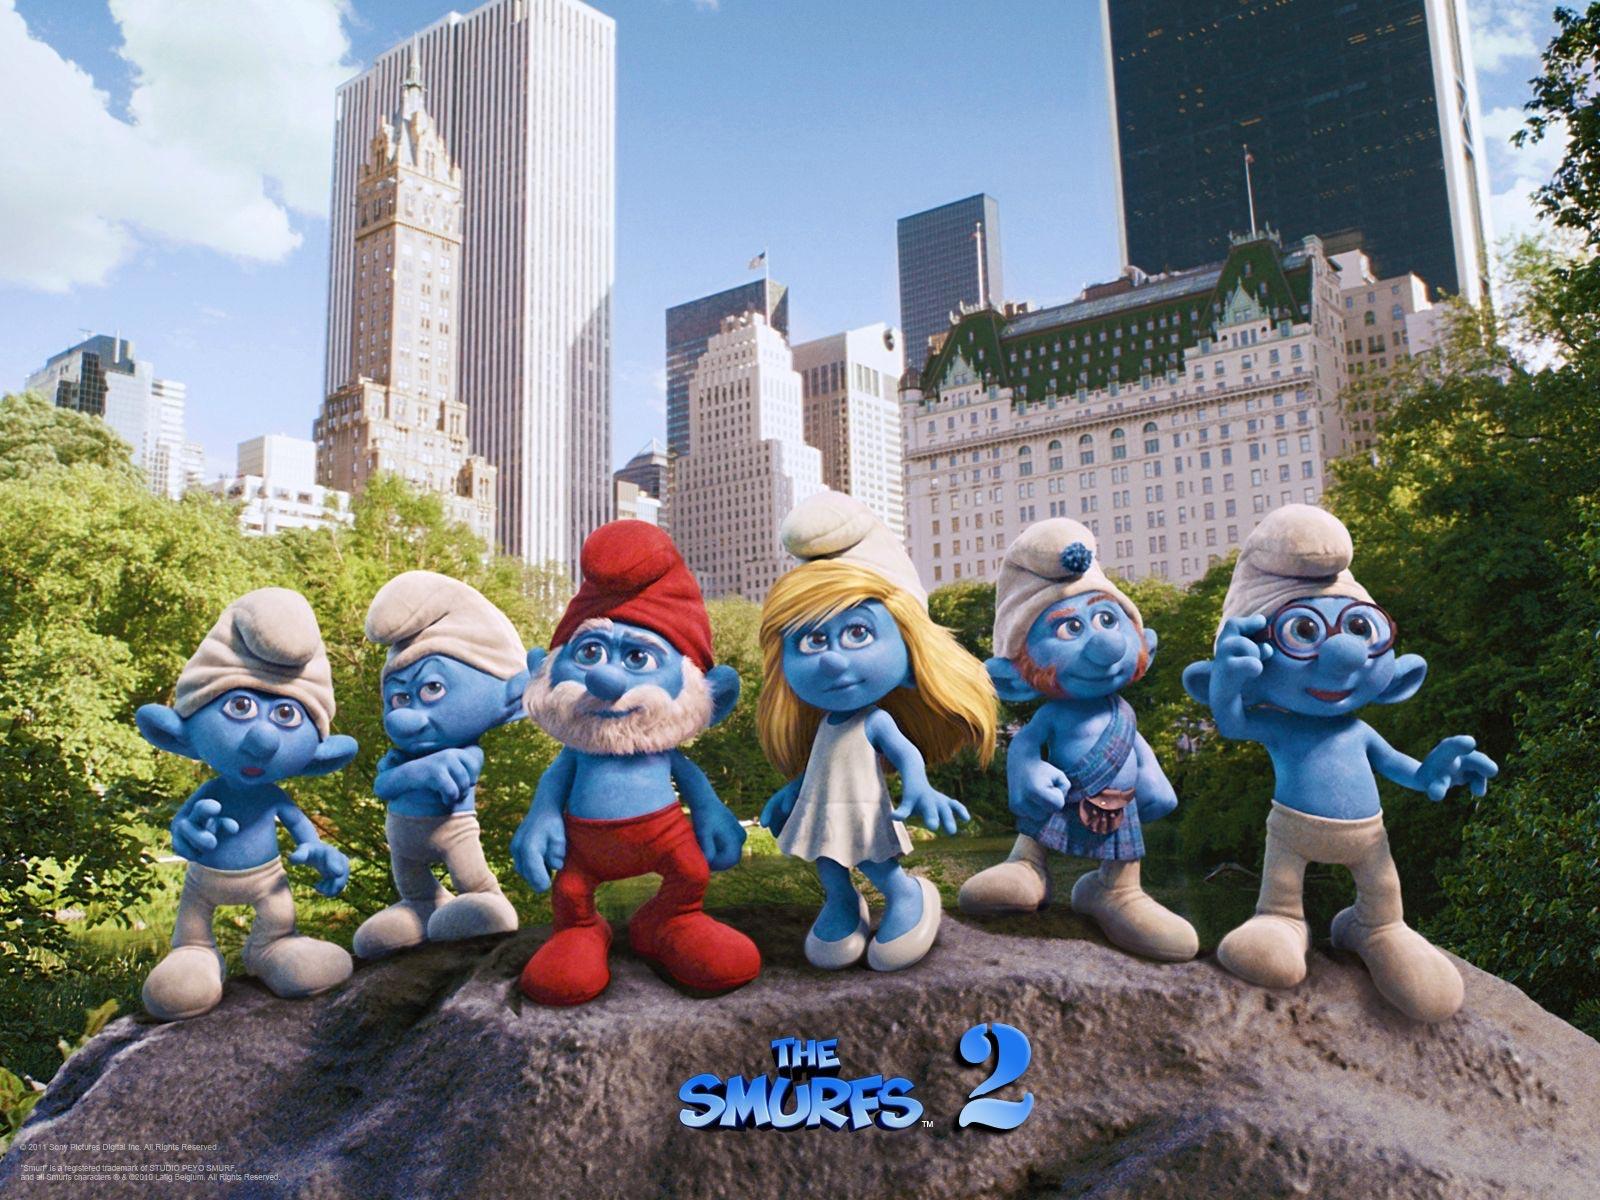 Production begins on the smurfs 2 plot details revealed